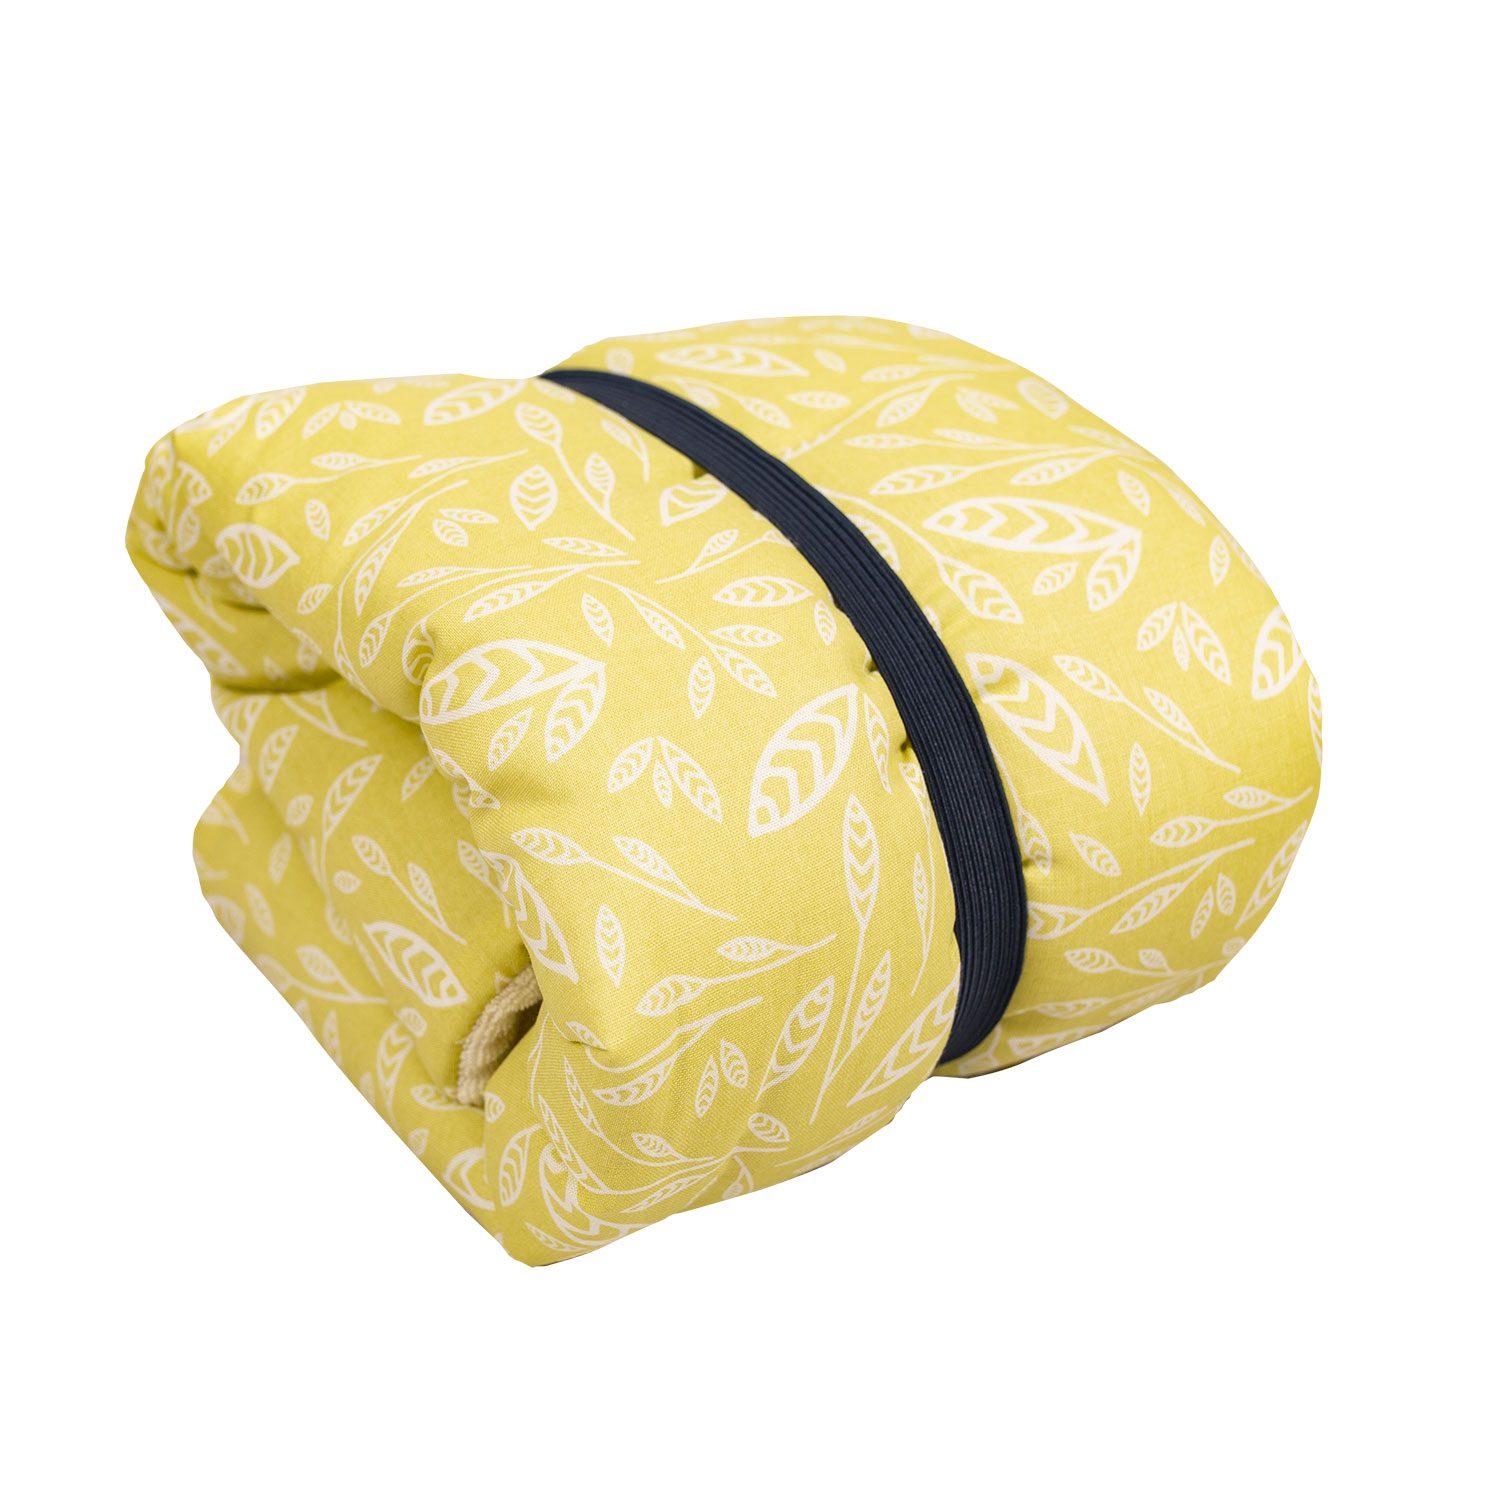 matelas à langer en coton biologique motif savane chabadabada